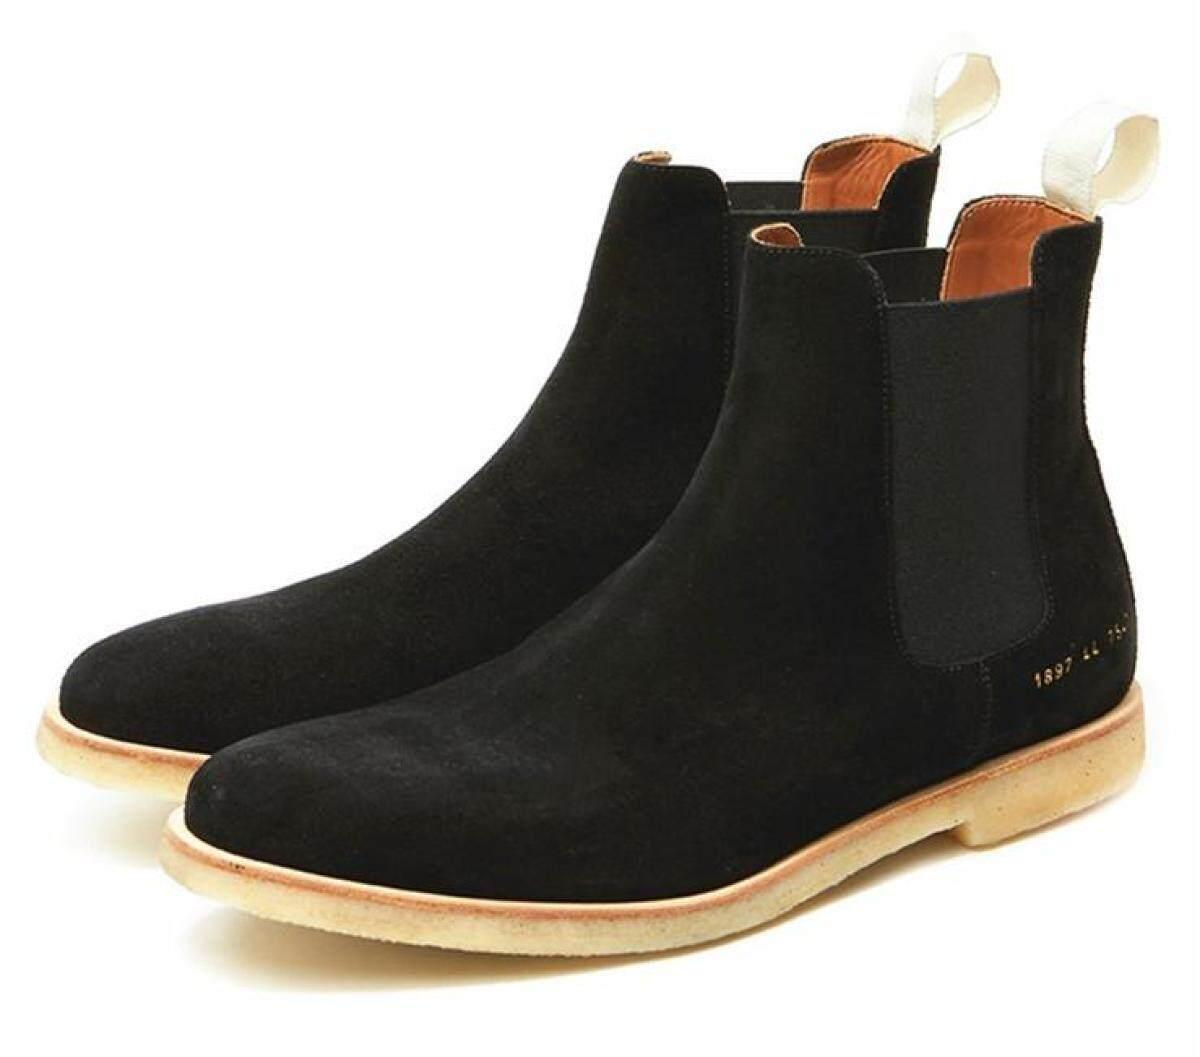 England Big Talker Chelsea Boots Men's Short Boots Leather Pointed Versatile Black Vintage Hight-top Martin Shoes Men's Boots Fashion